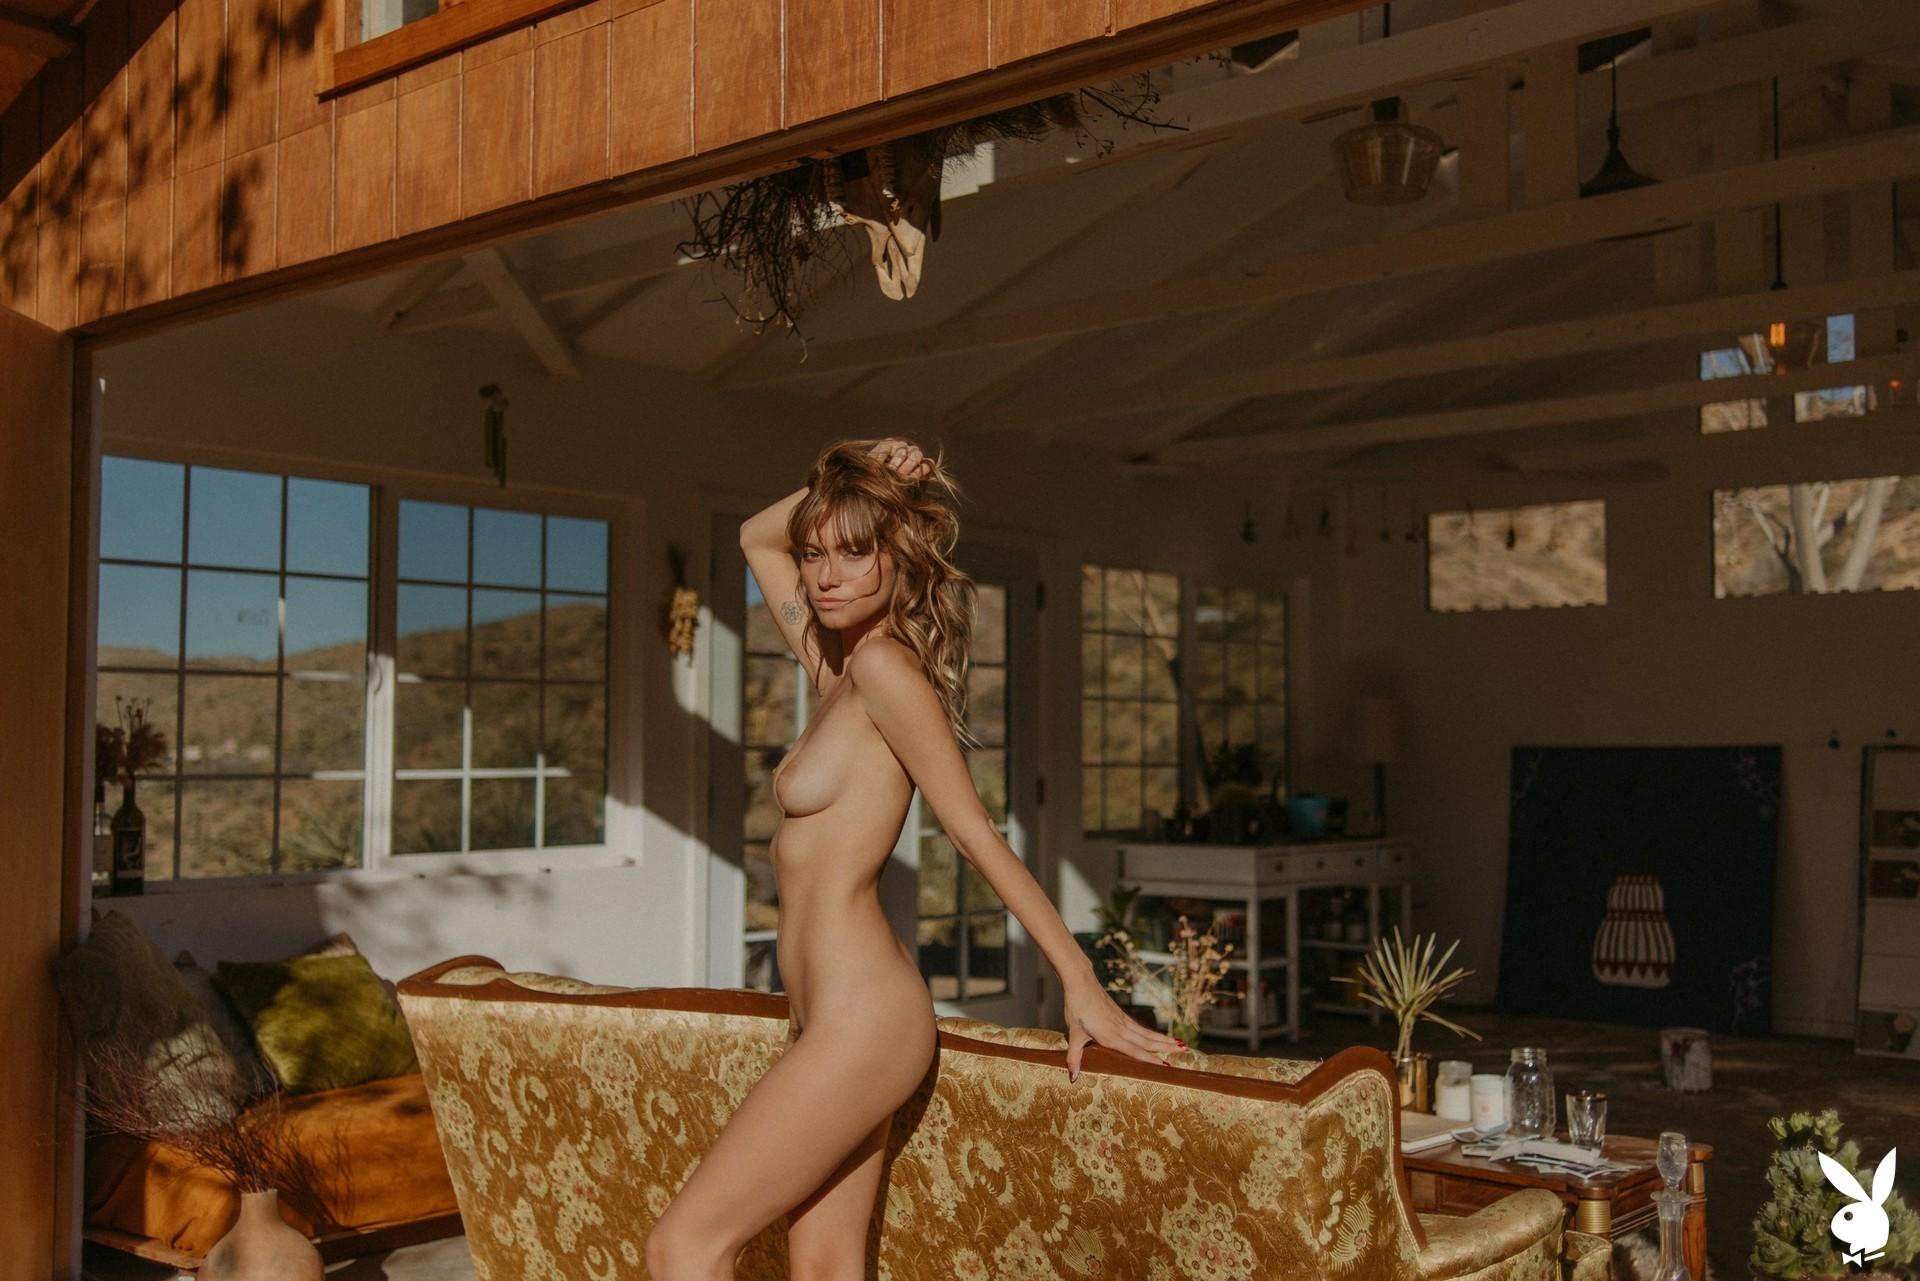 Nastasia Celeste In Creative Space Playboy Plus (38)